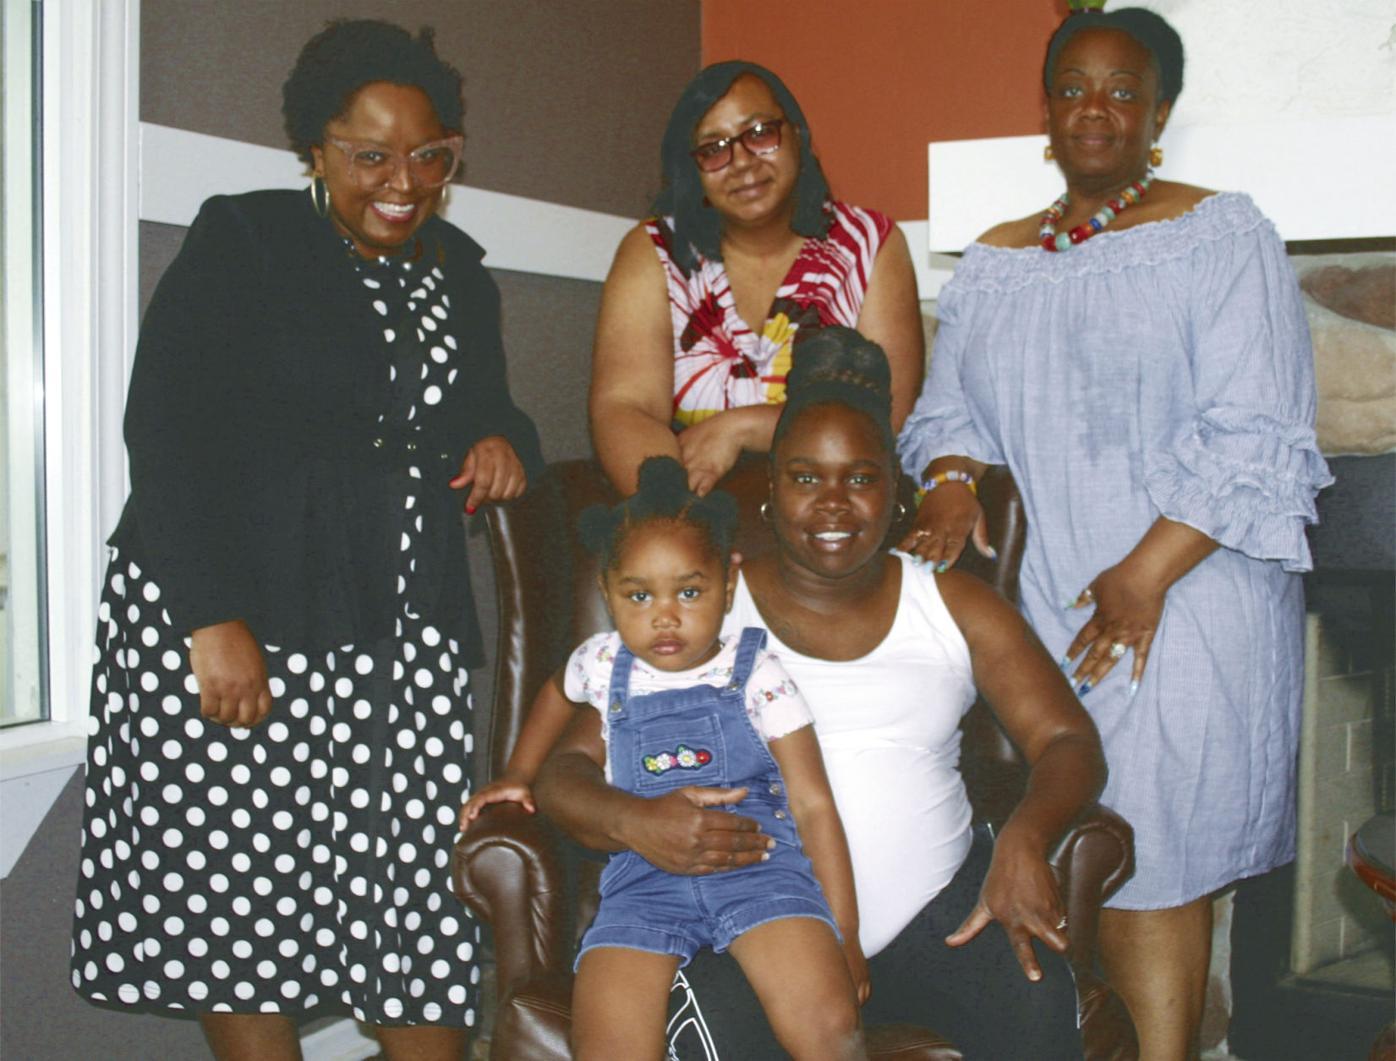 Serving families